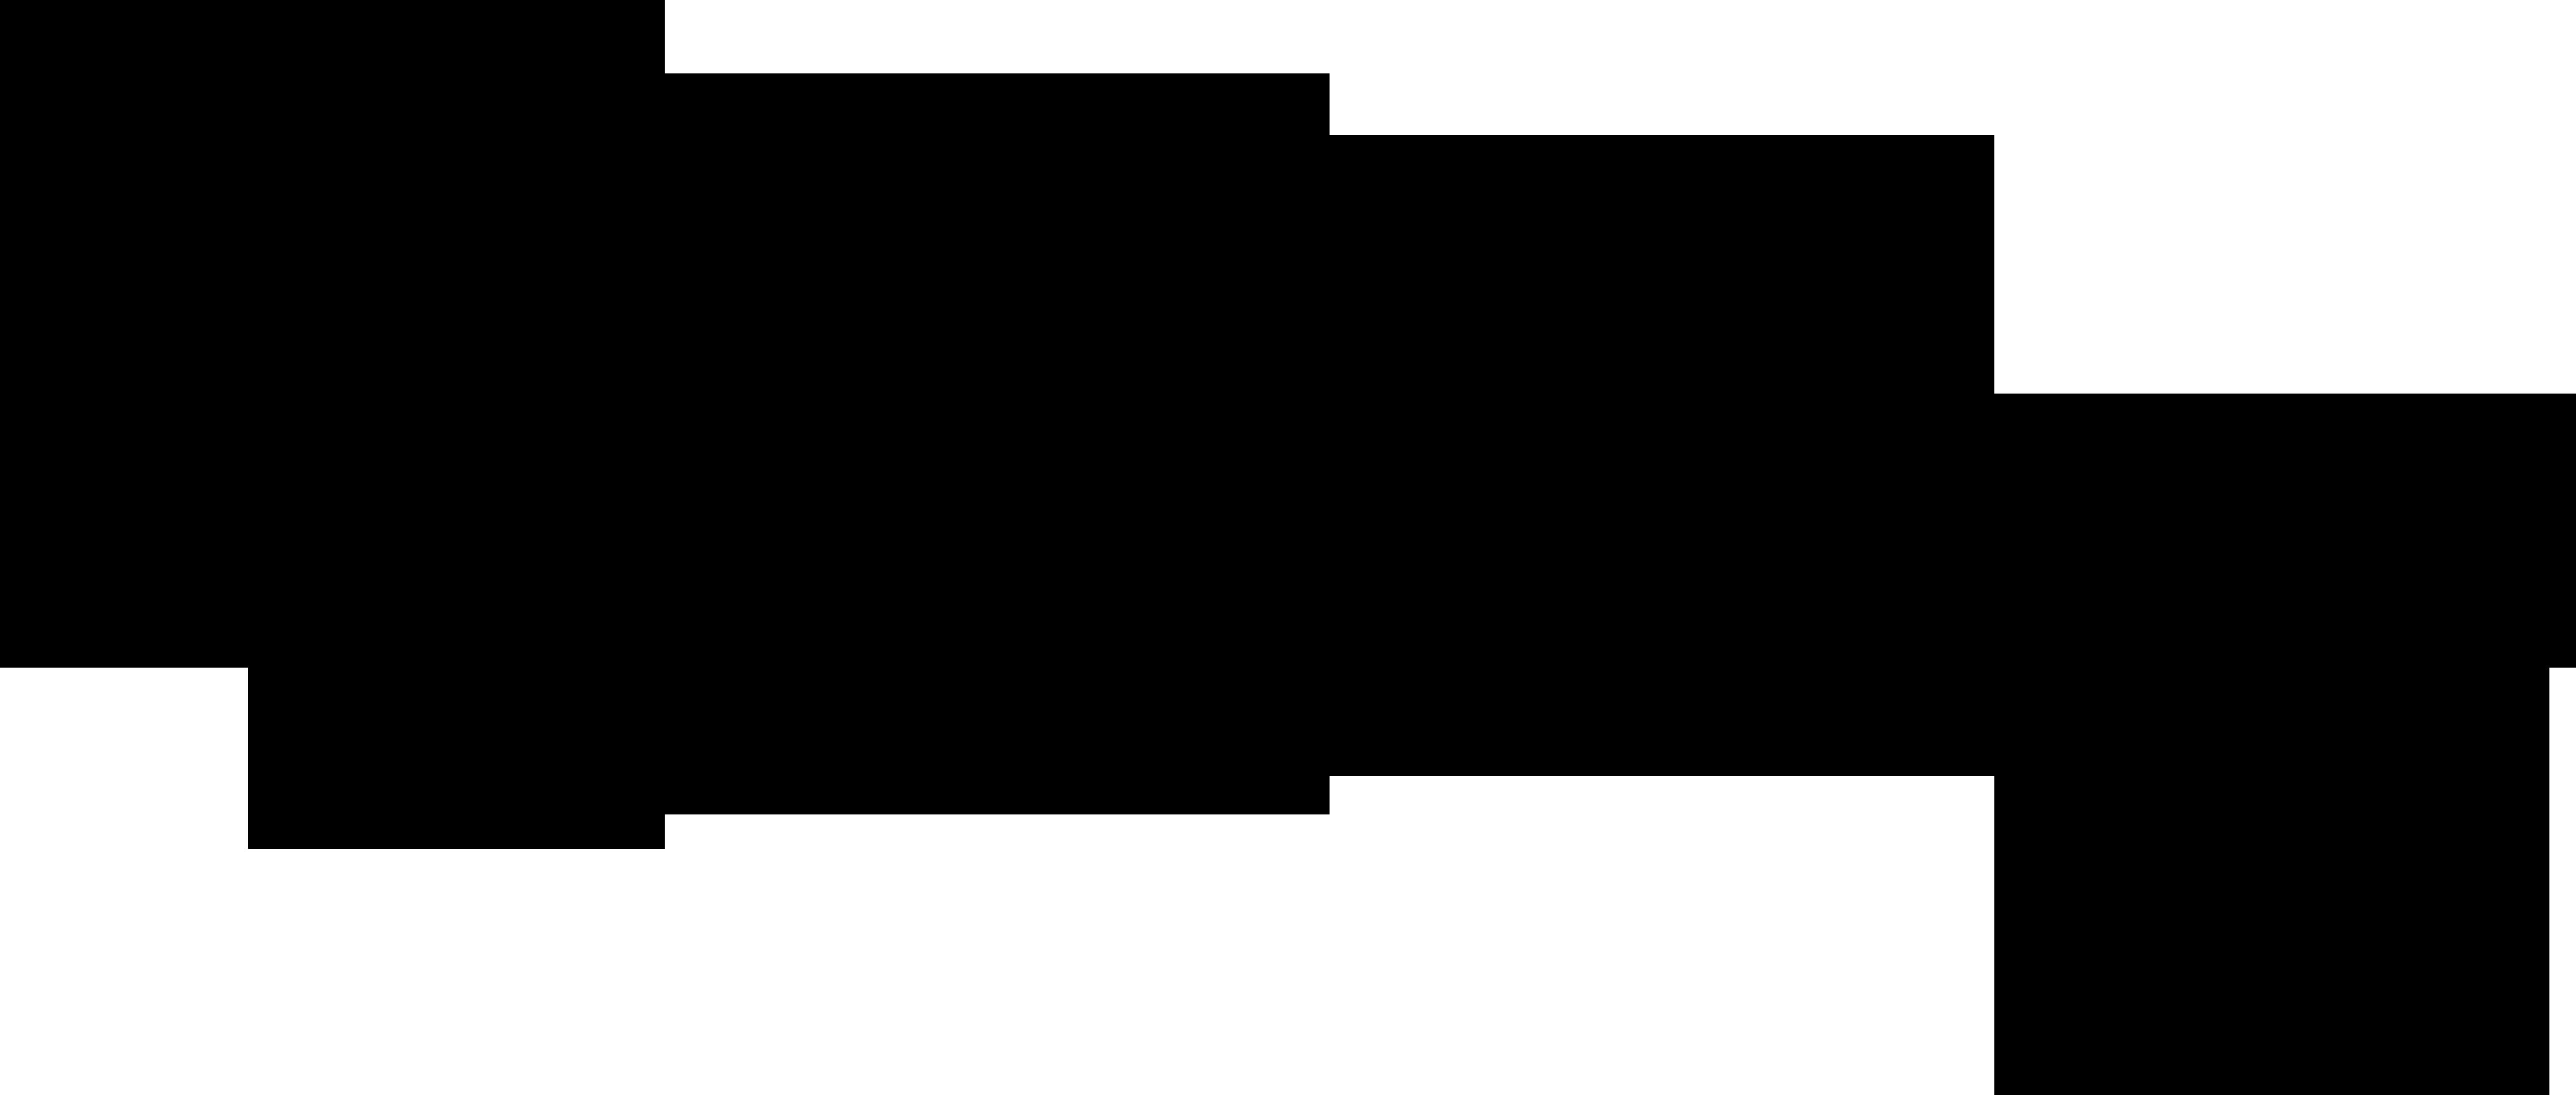 Disney Logo HD Wallpapers Download Free Tumblr